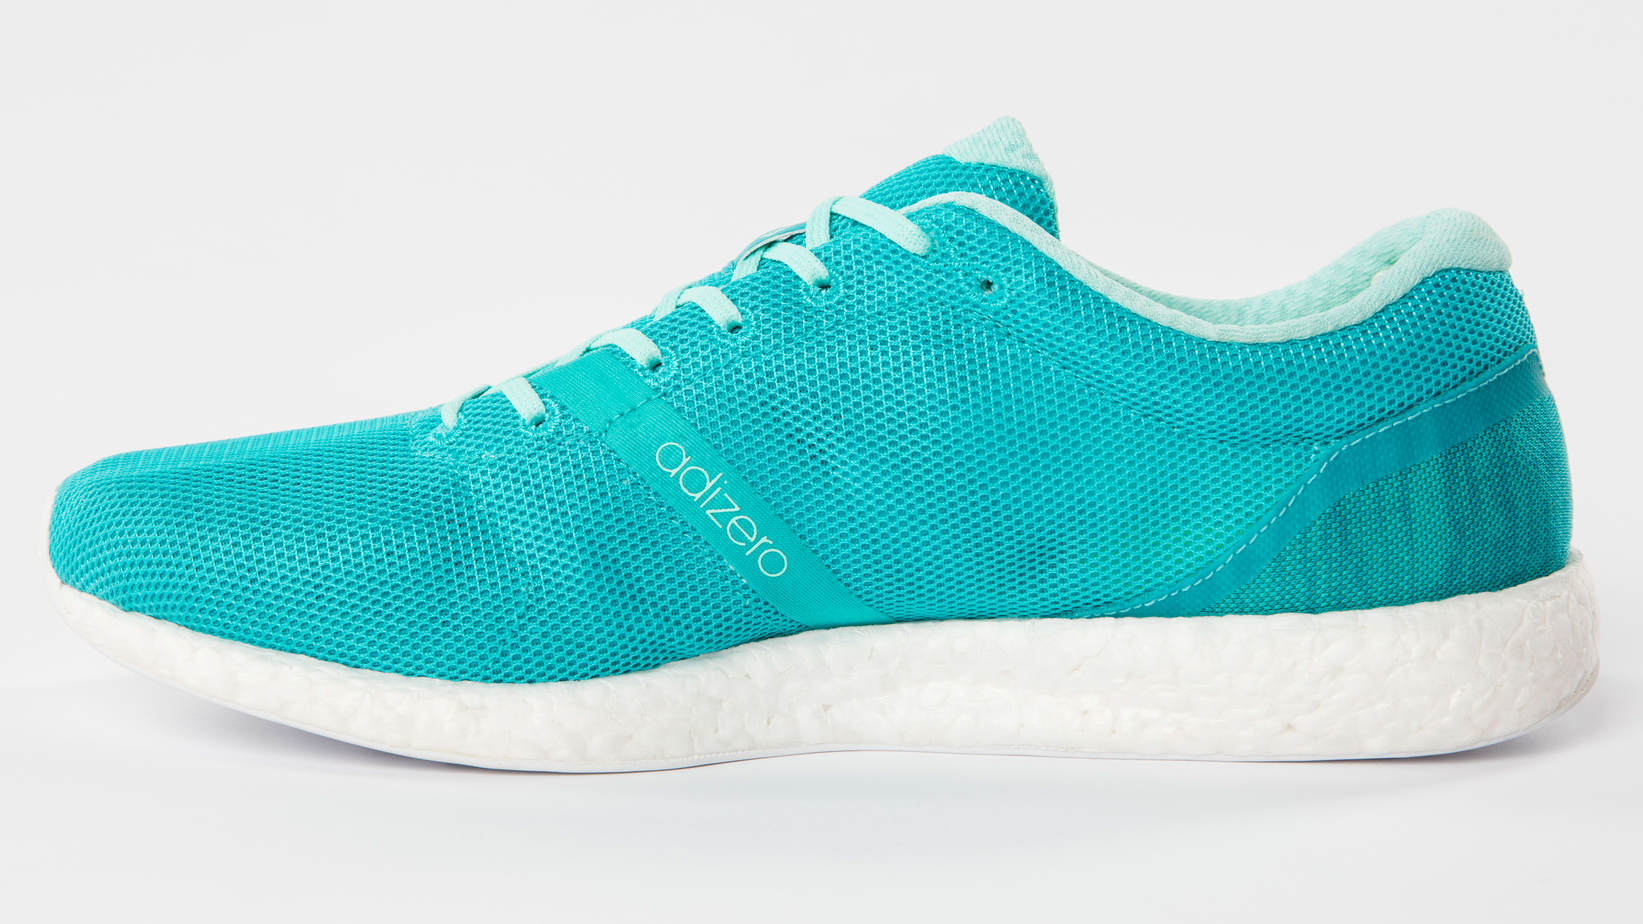 adidas Boost Light Debuts on the Adizero Sub2 - JustFreshKicks 8d04f177d